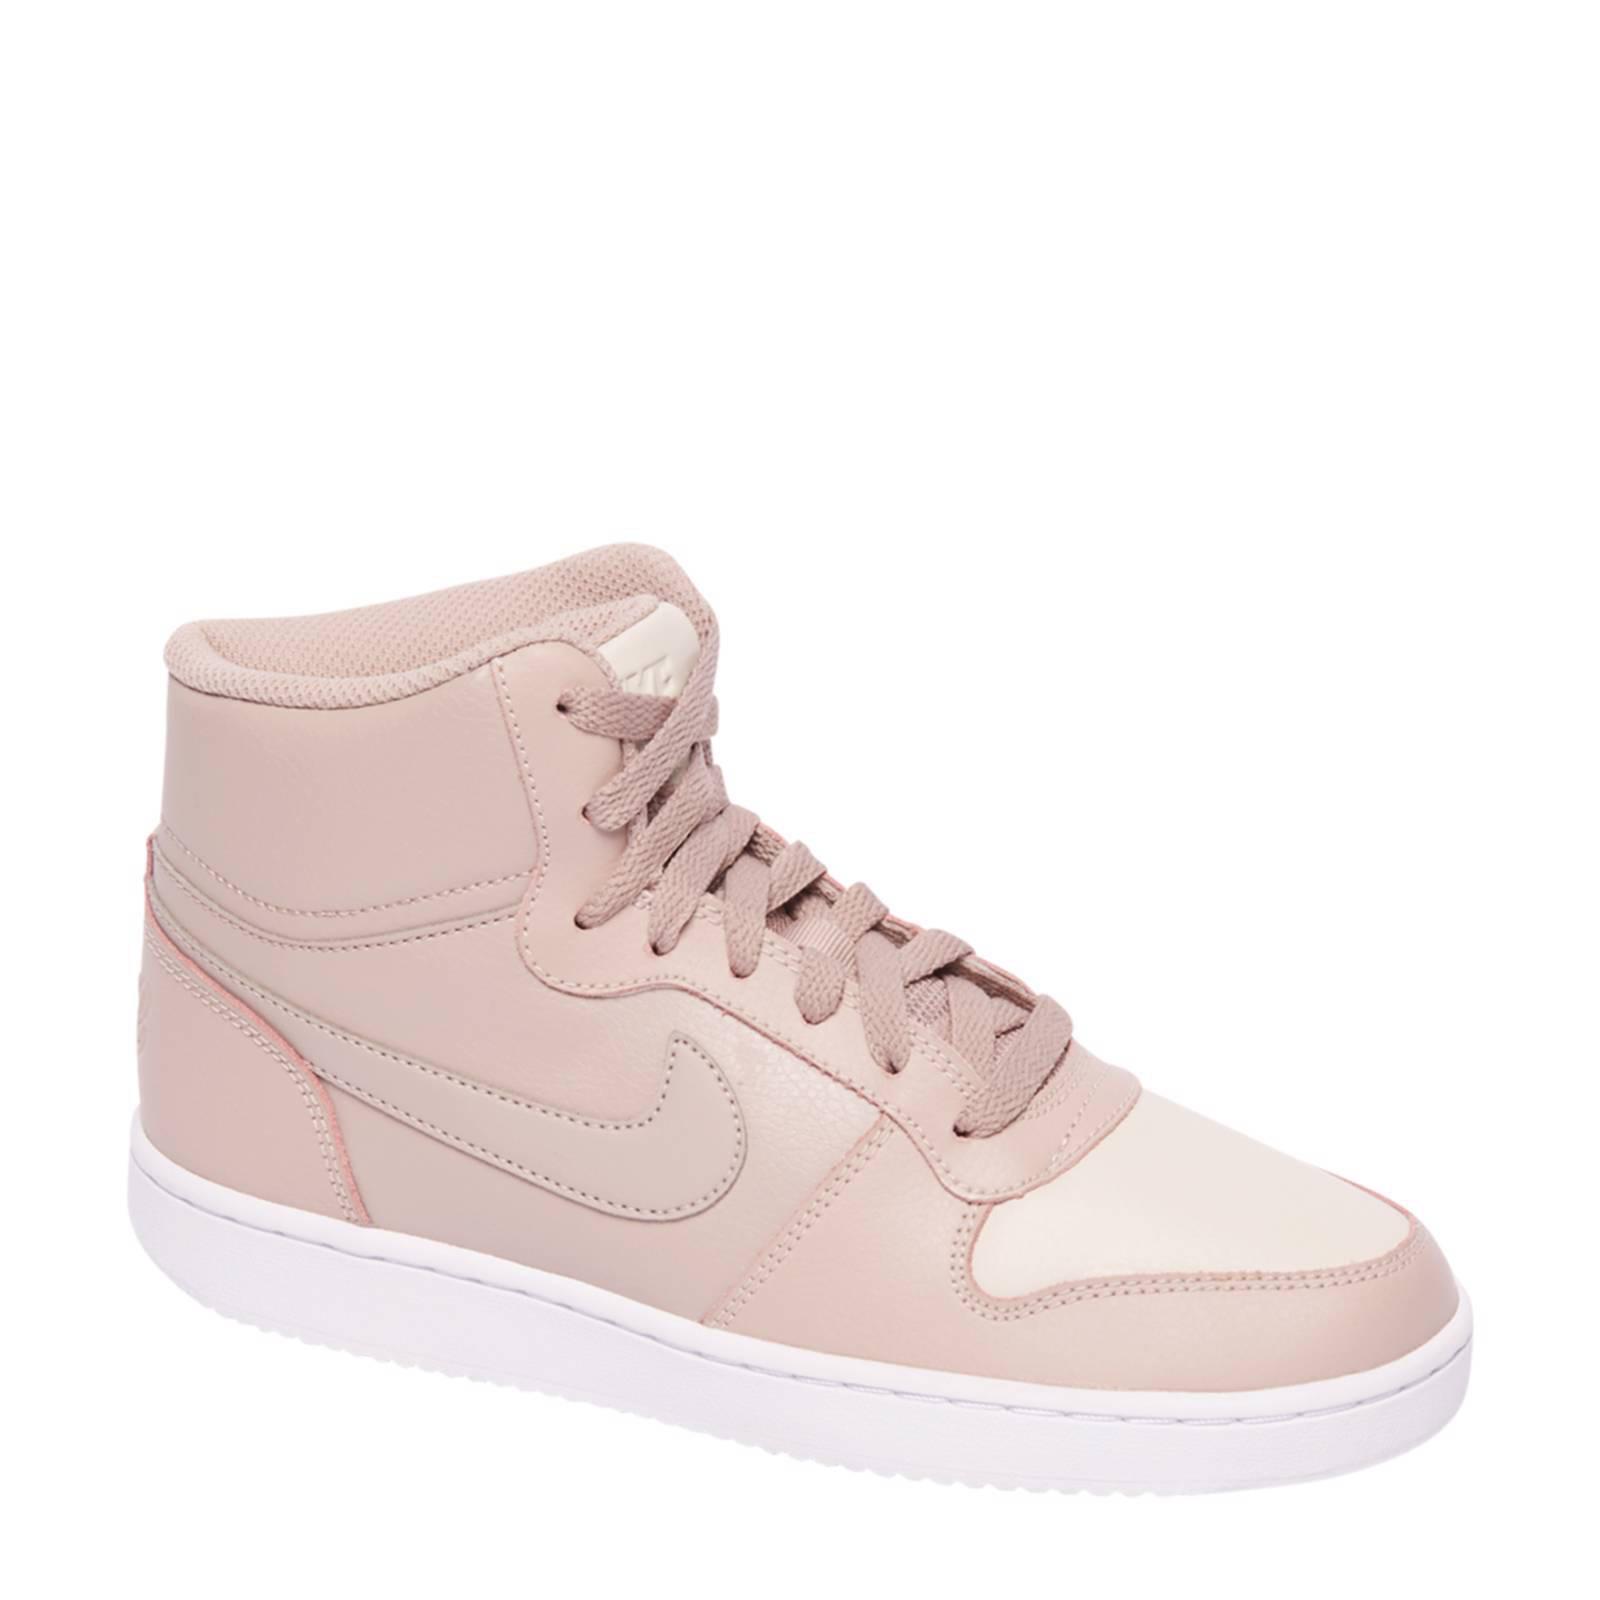 Nike Ebernon Mid sneakers beige   wehkamp